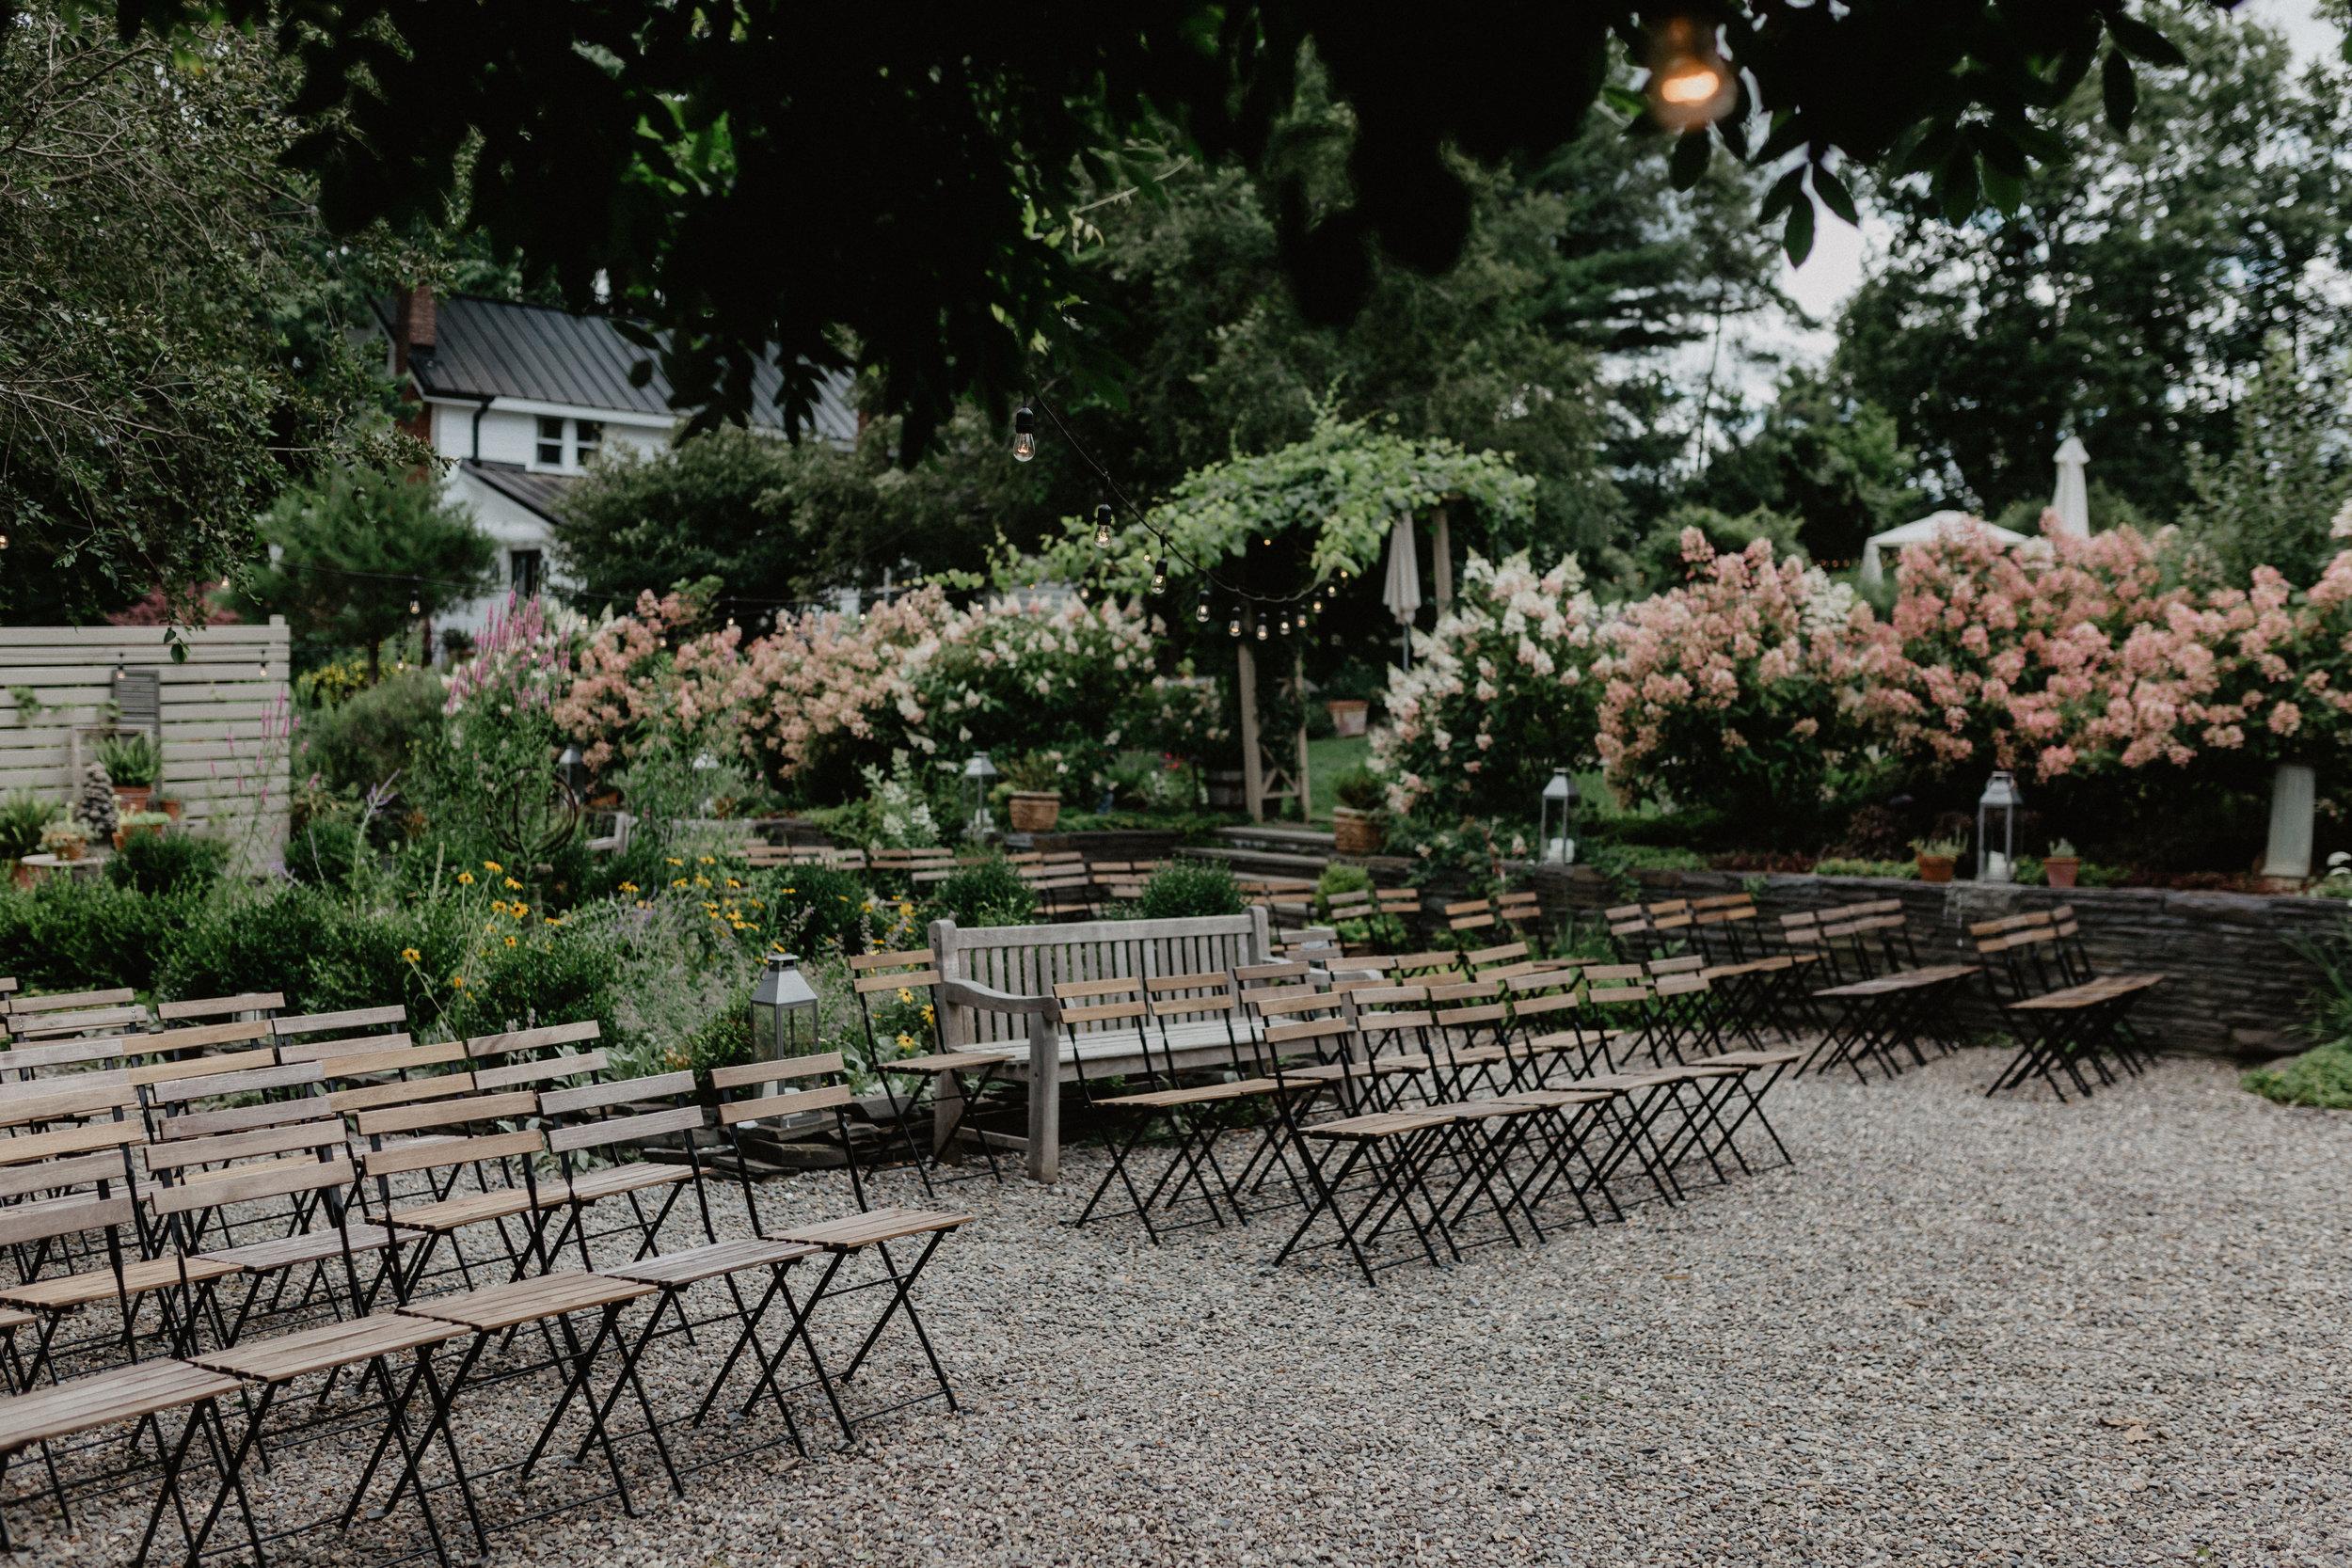 m-and-d-farm-wedding-15.jpg